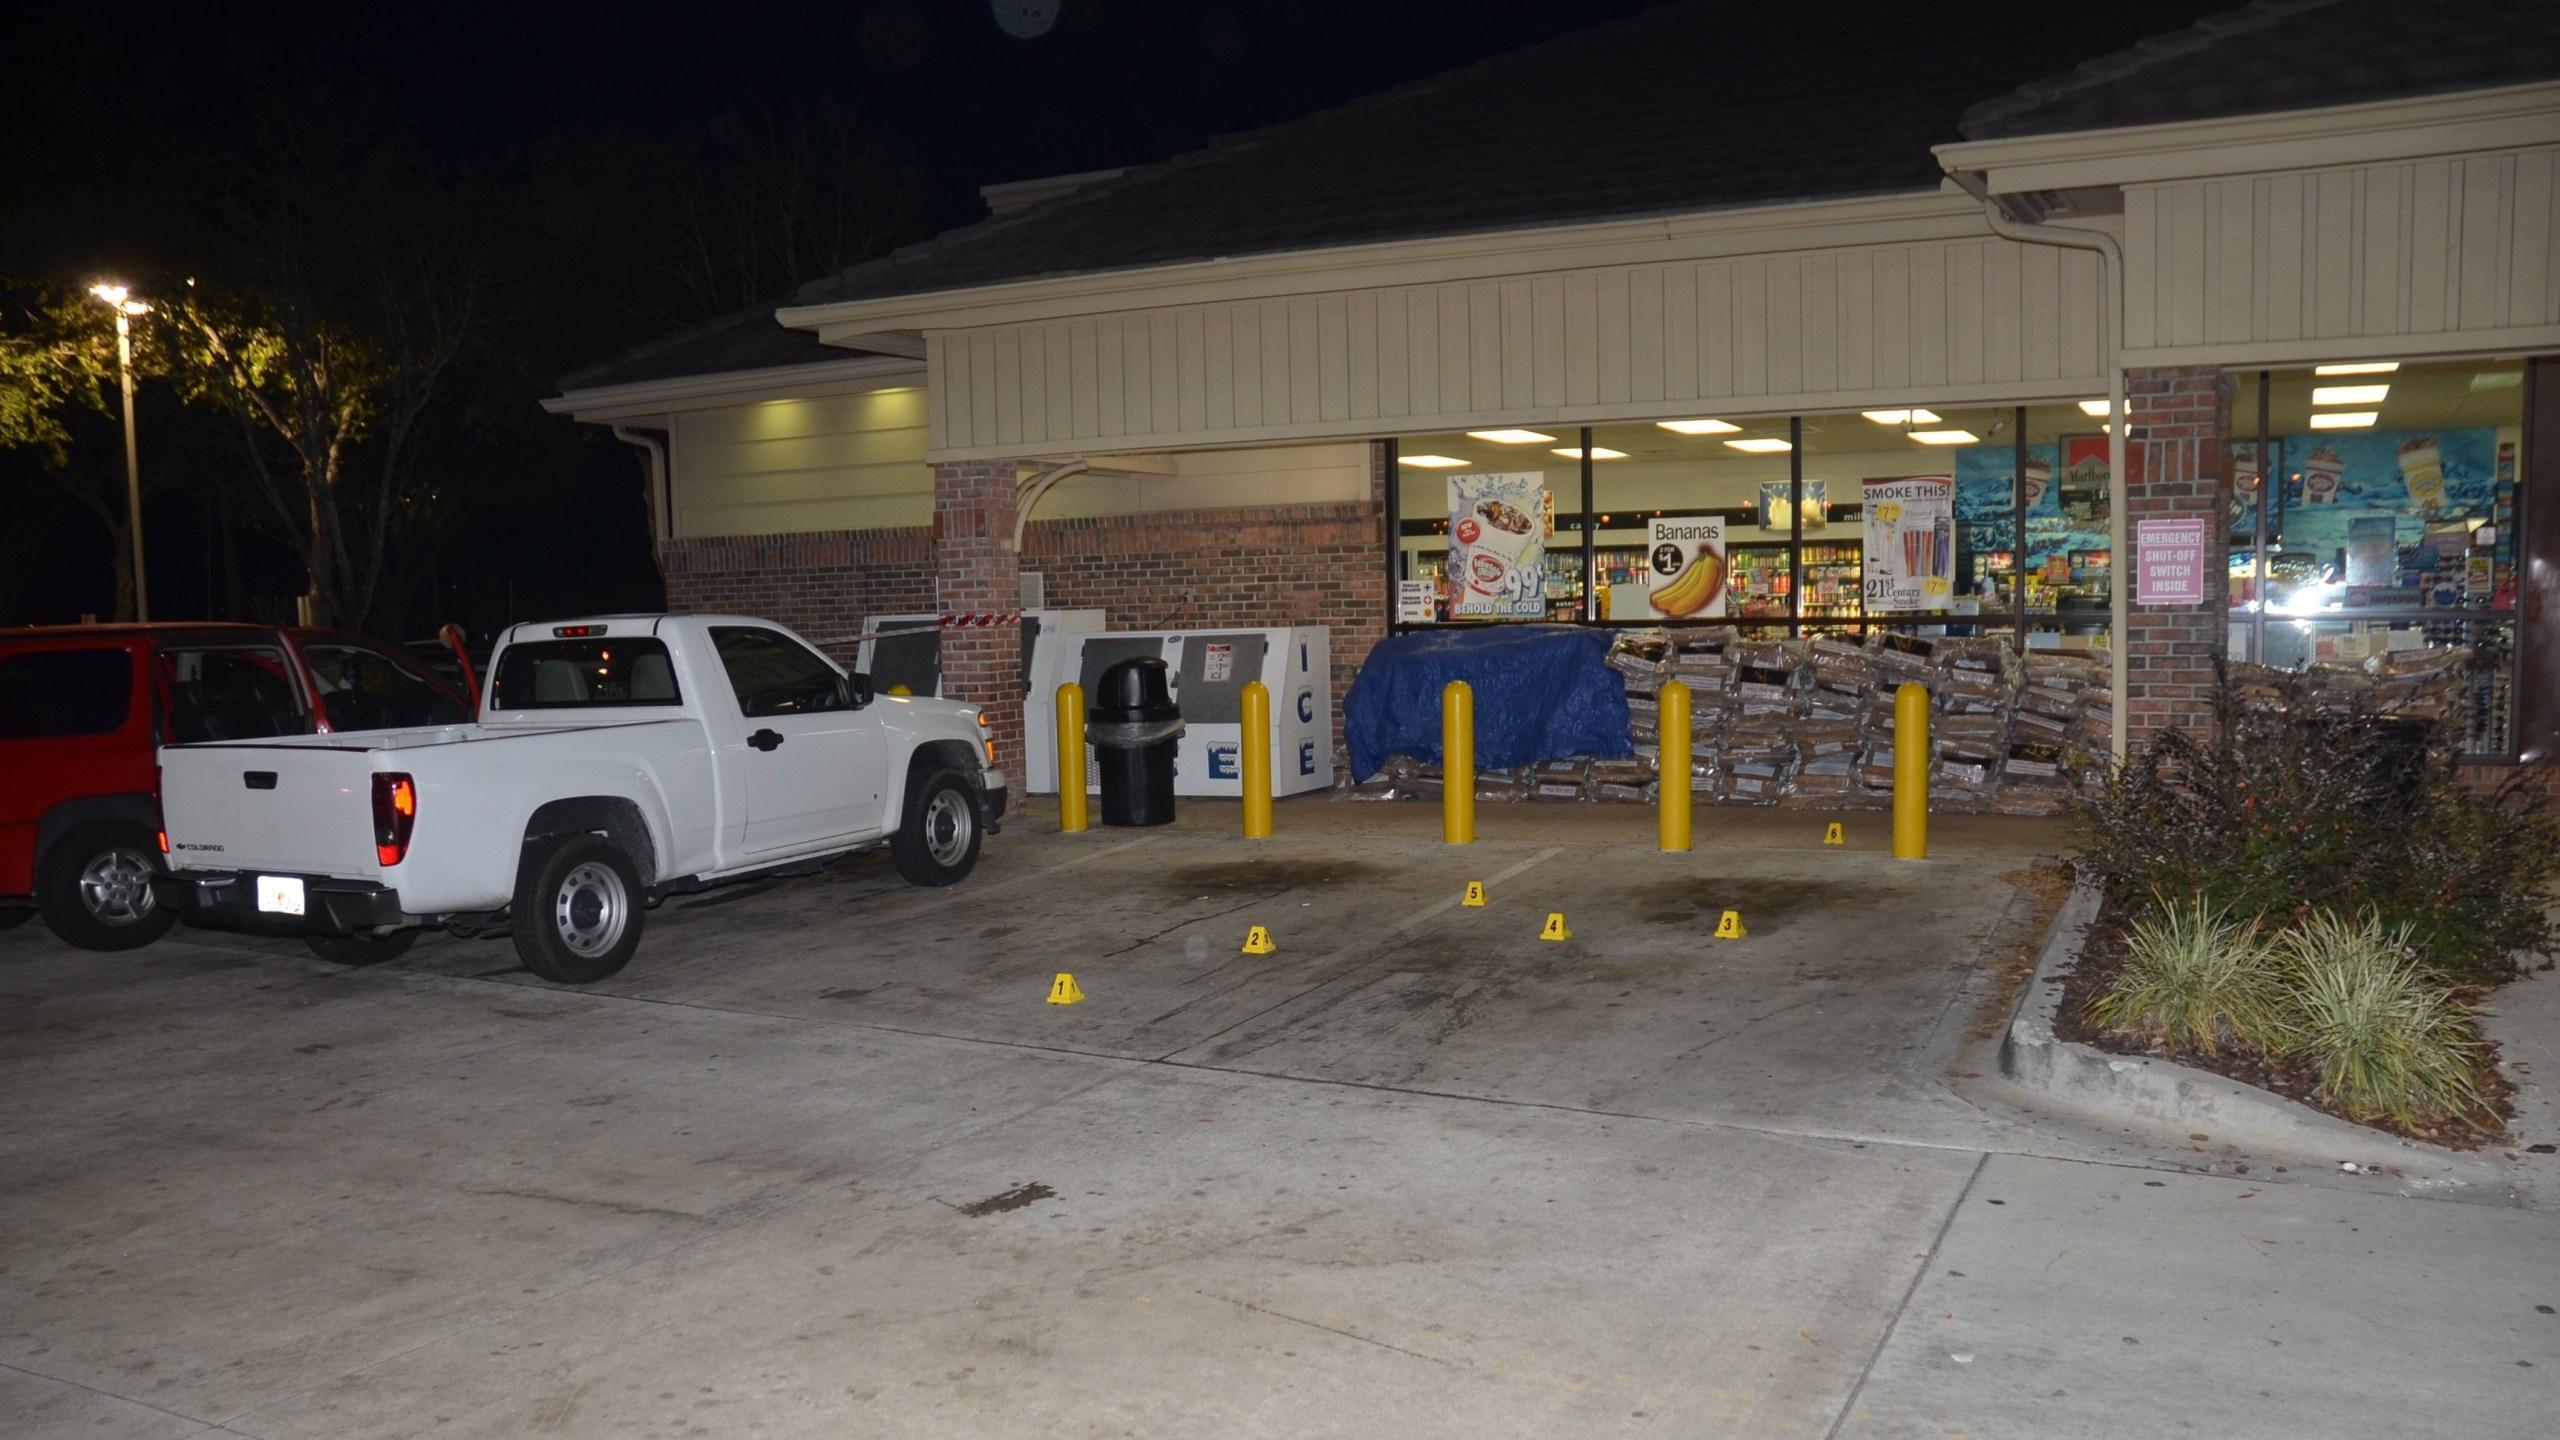 The Jacksonville sheriff collects evidence in the Jordan Davis murder case. (Photo: CNN)